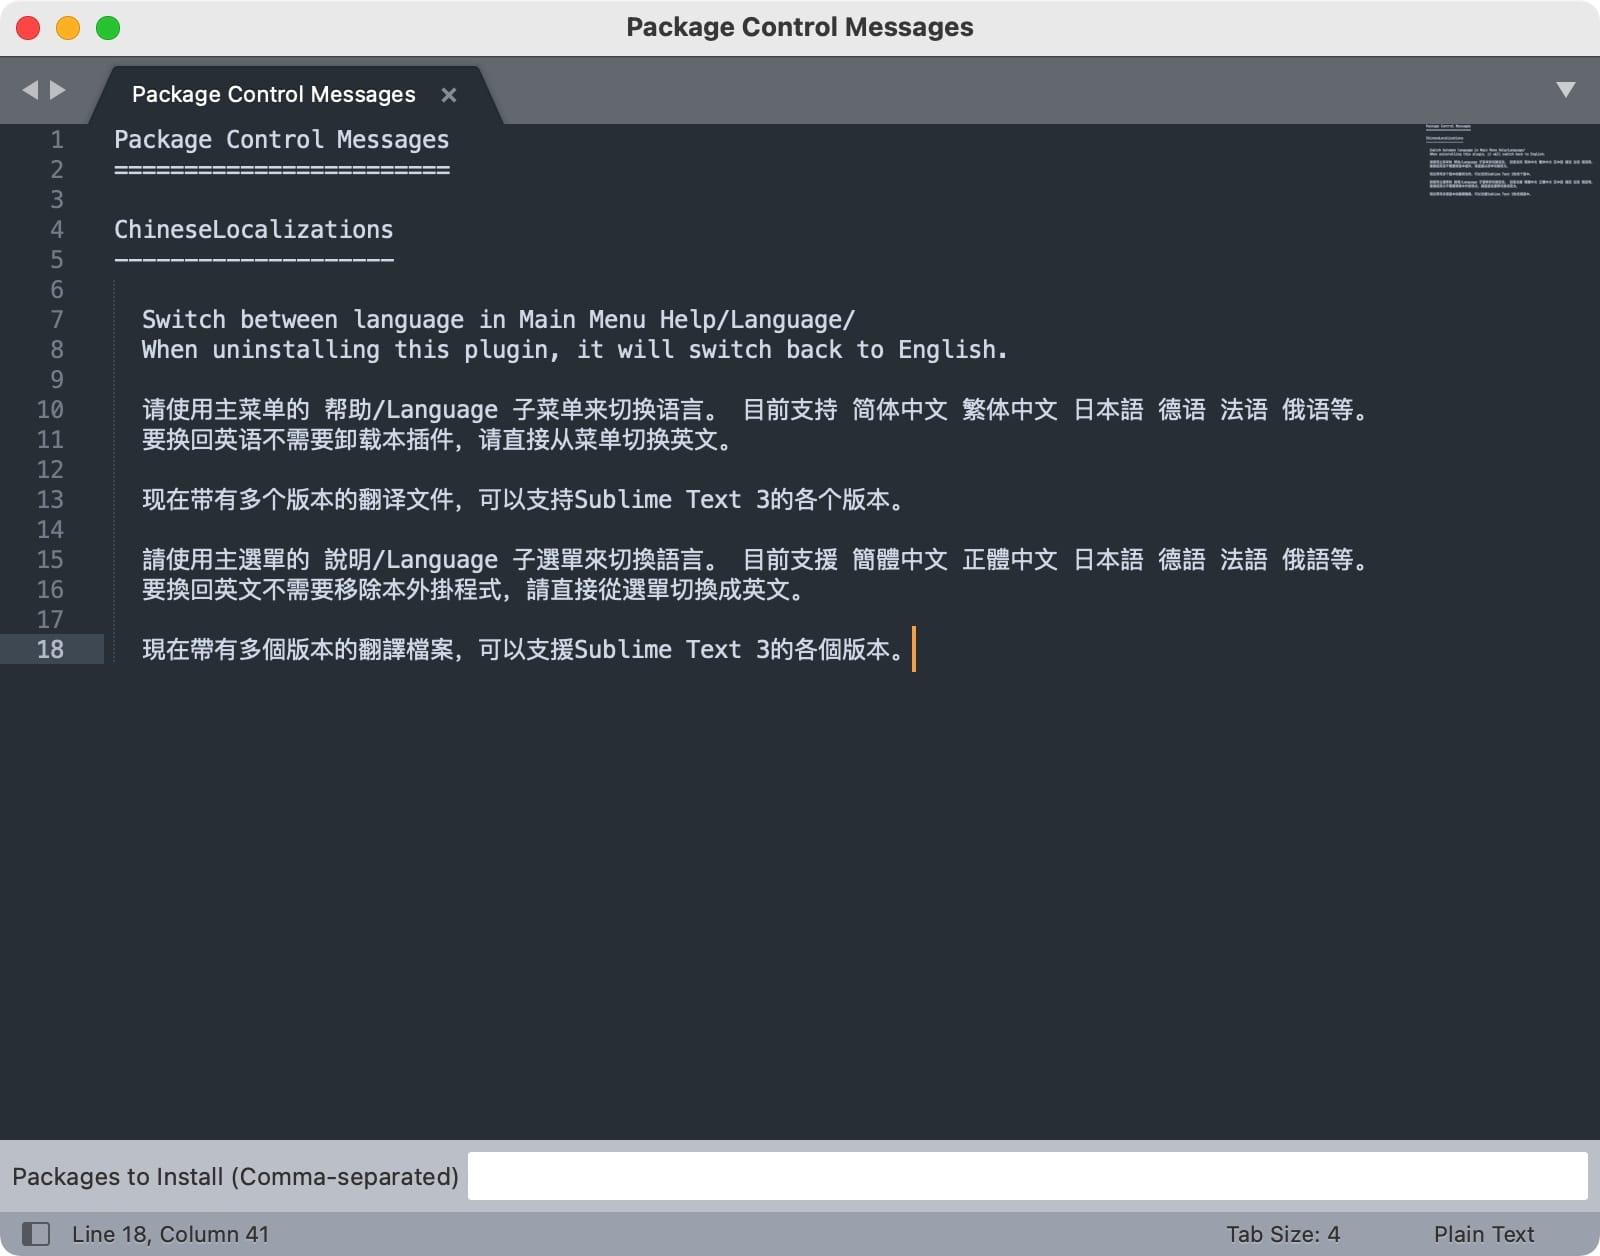 5fb8060dd6cb0 - 教程 | Sublime Text汉化教程